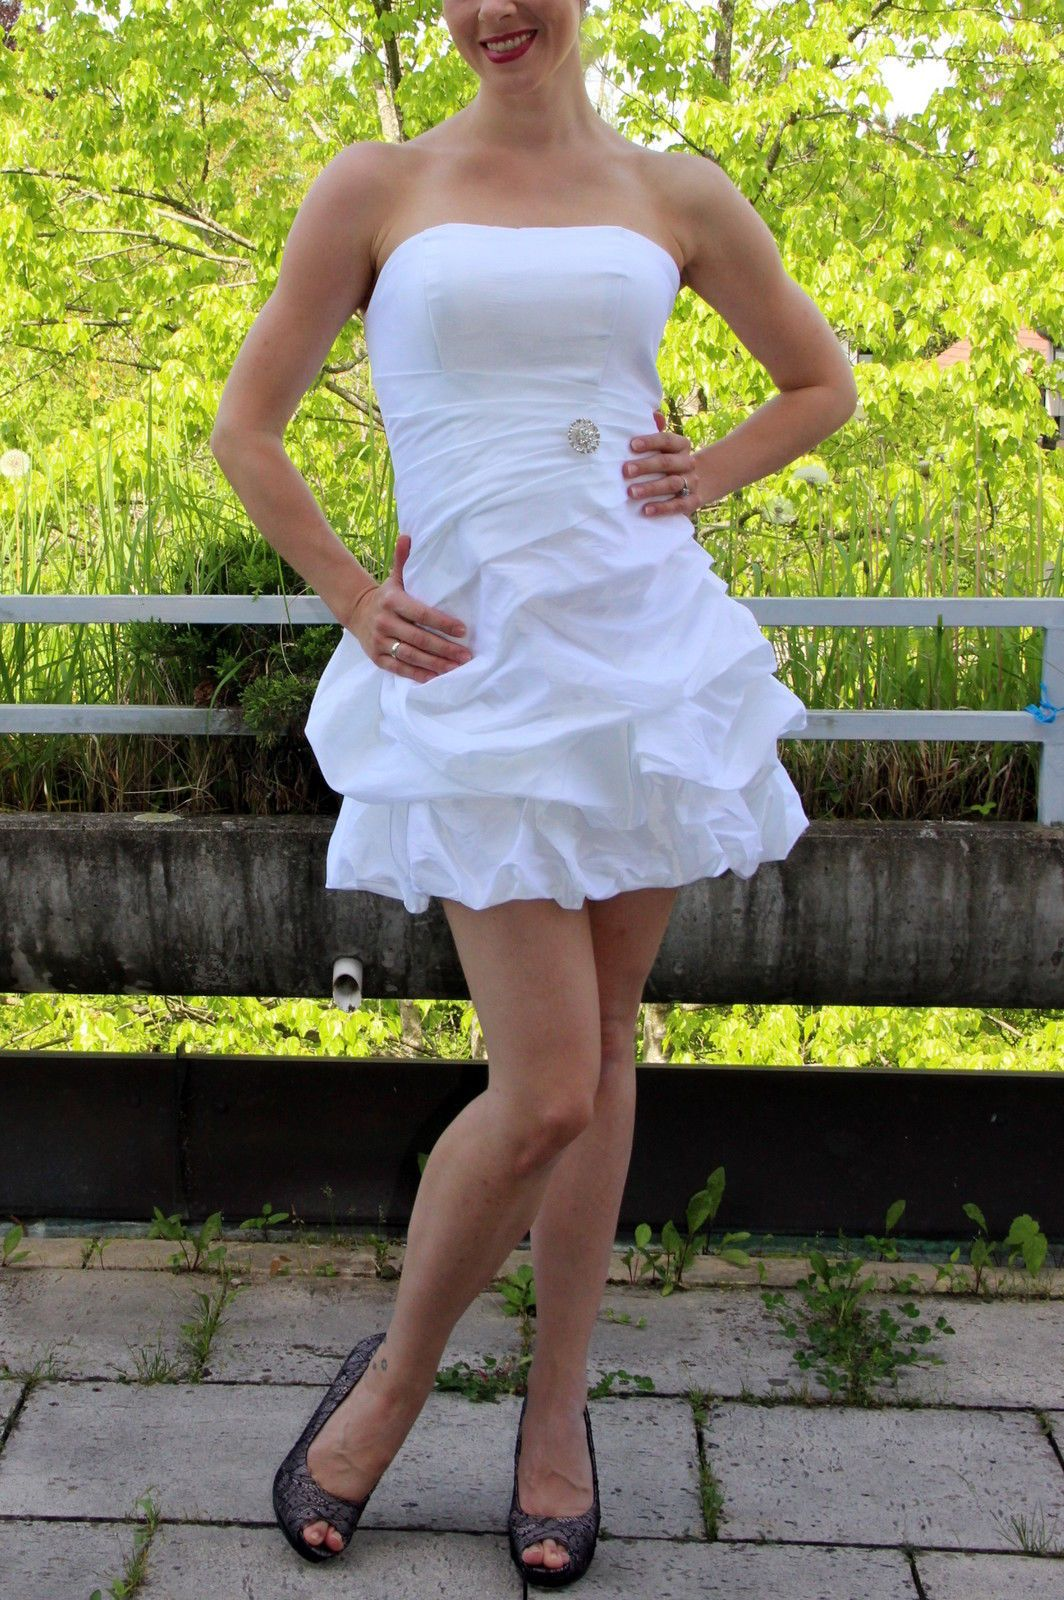 Zum Niederknien Haute Couture Abendkleid Brautkleid Gala Seide UVP ...